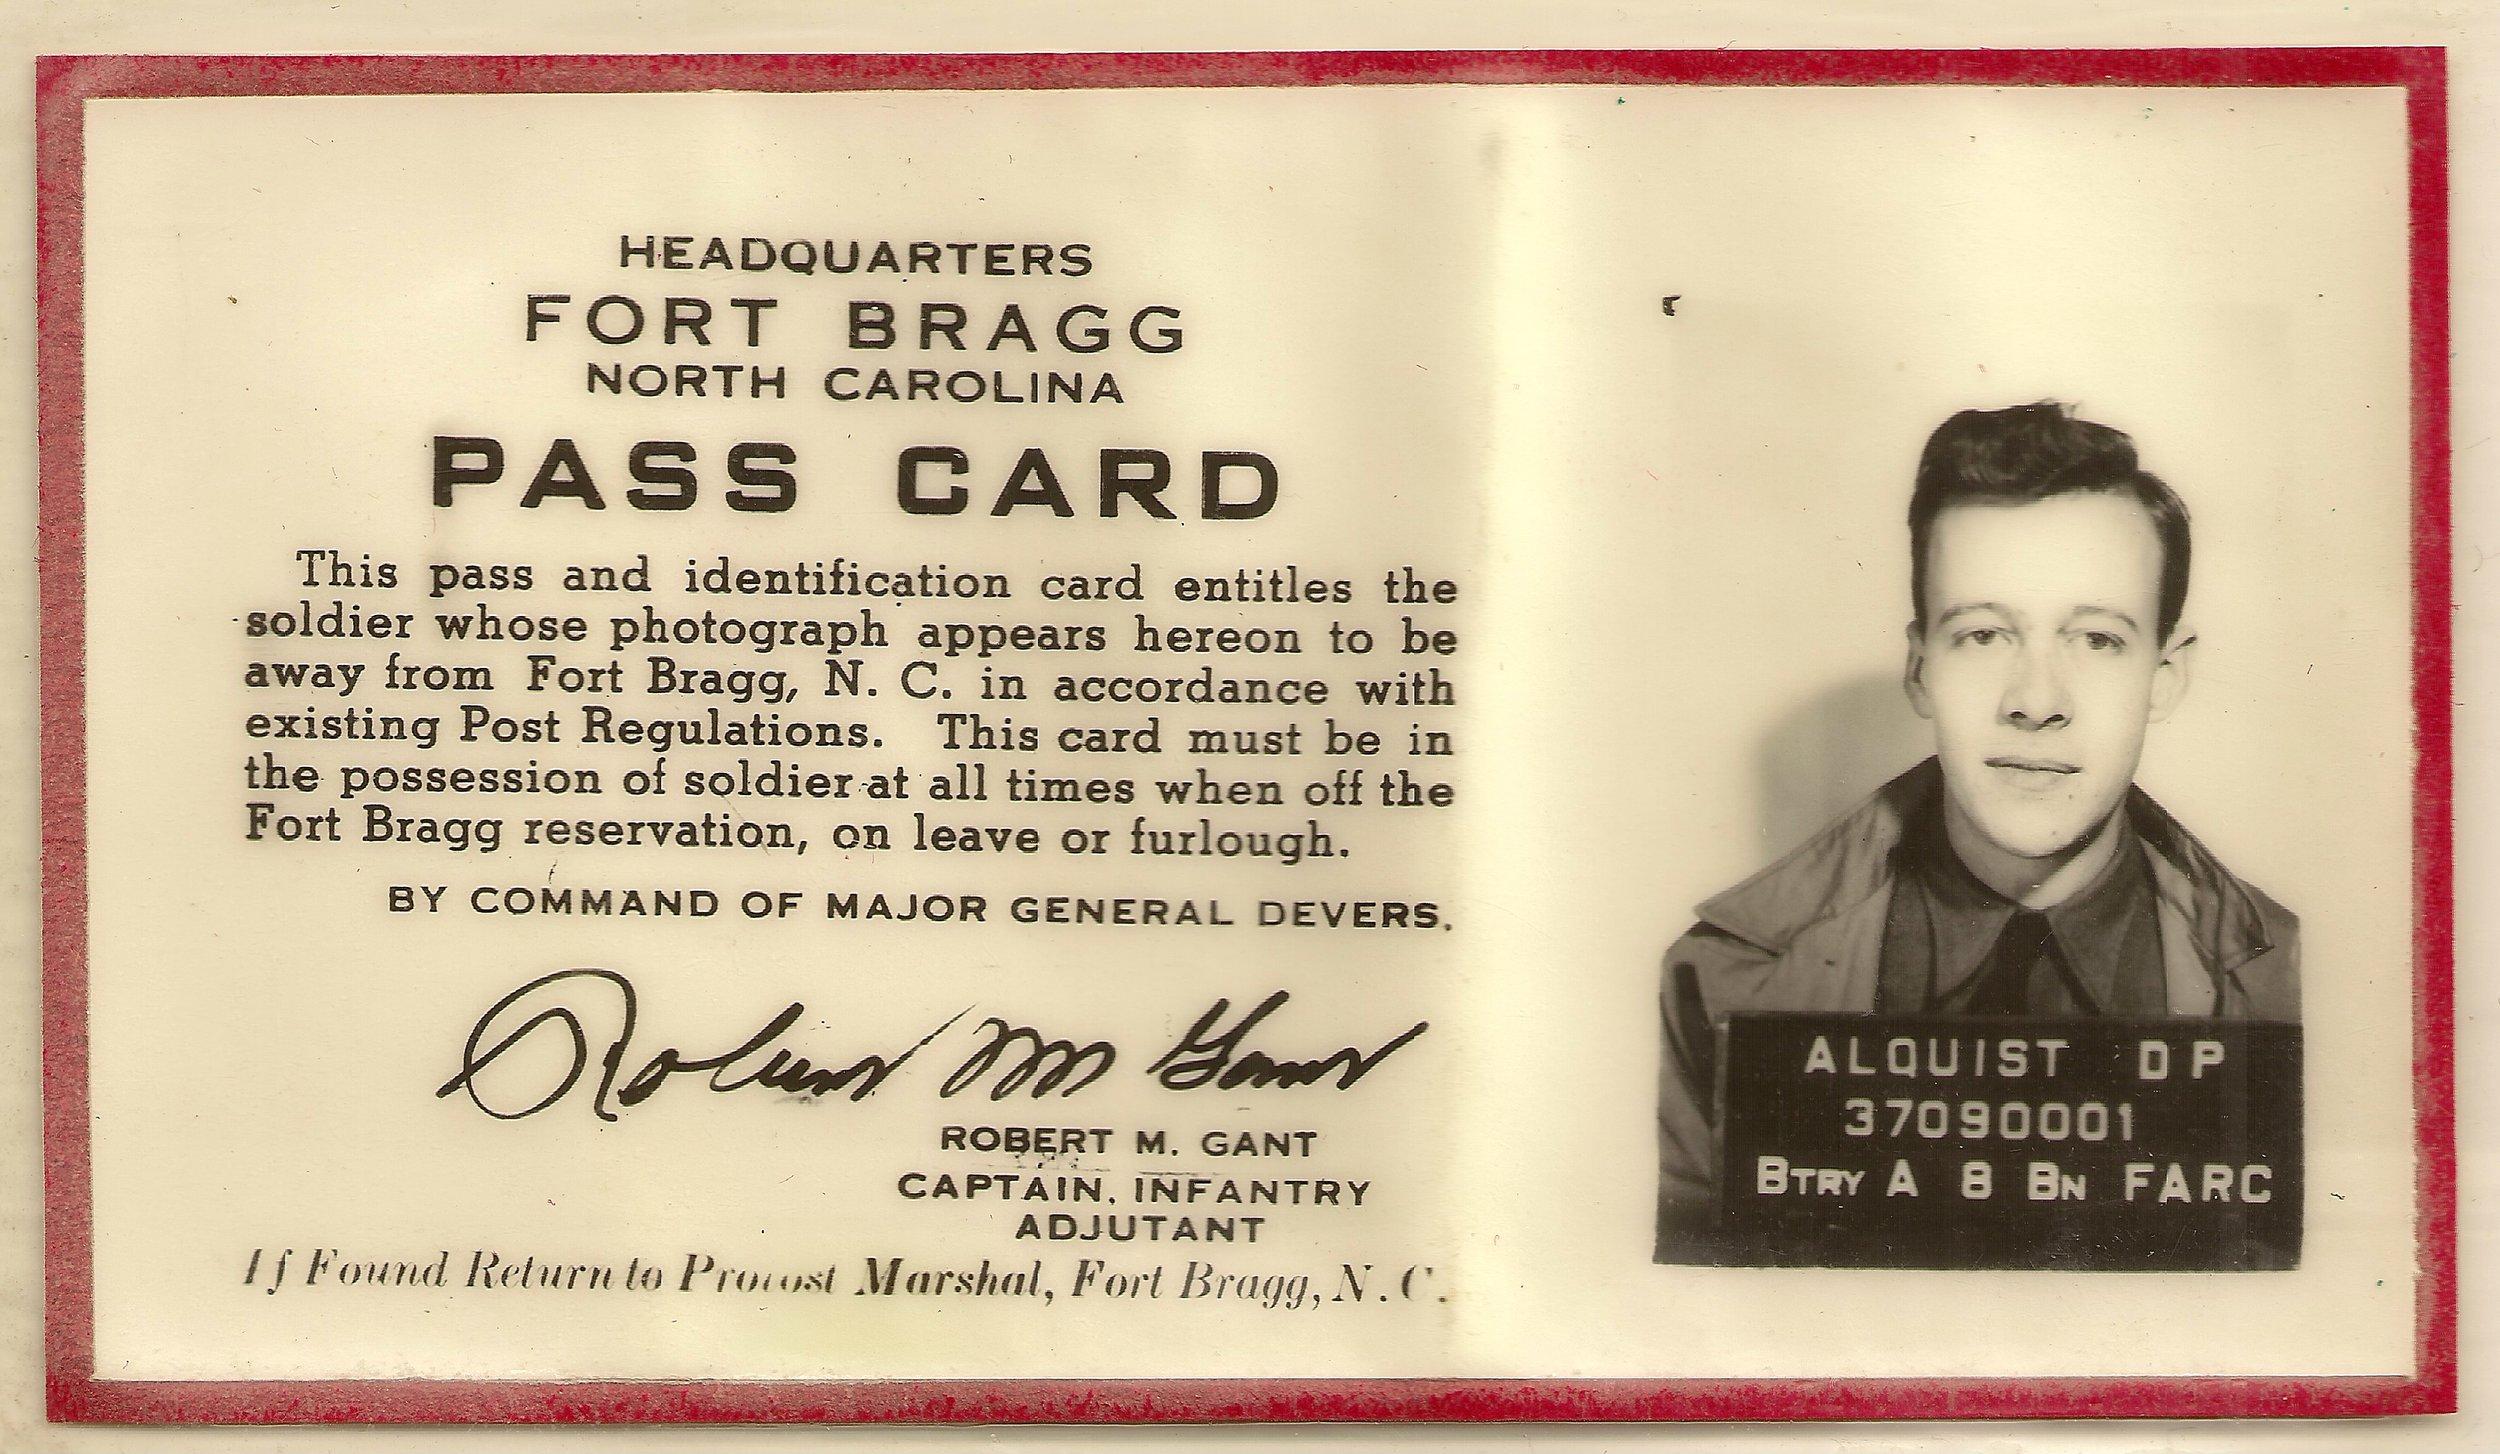 Fort Bragg Pass Card.jpg